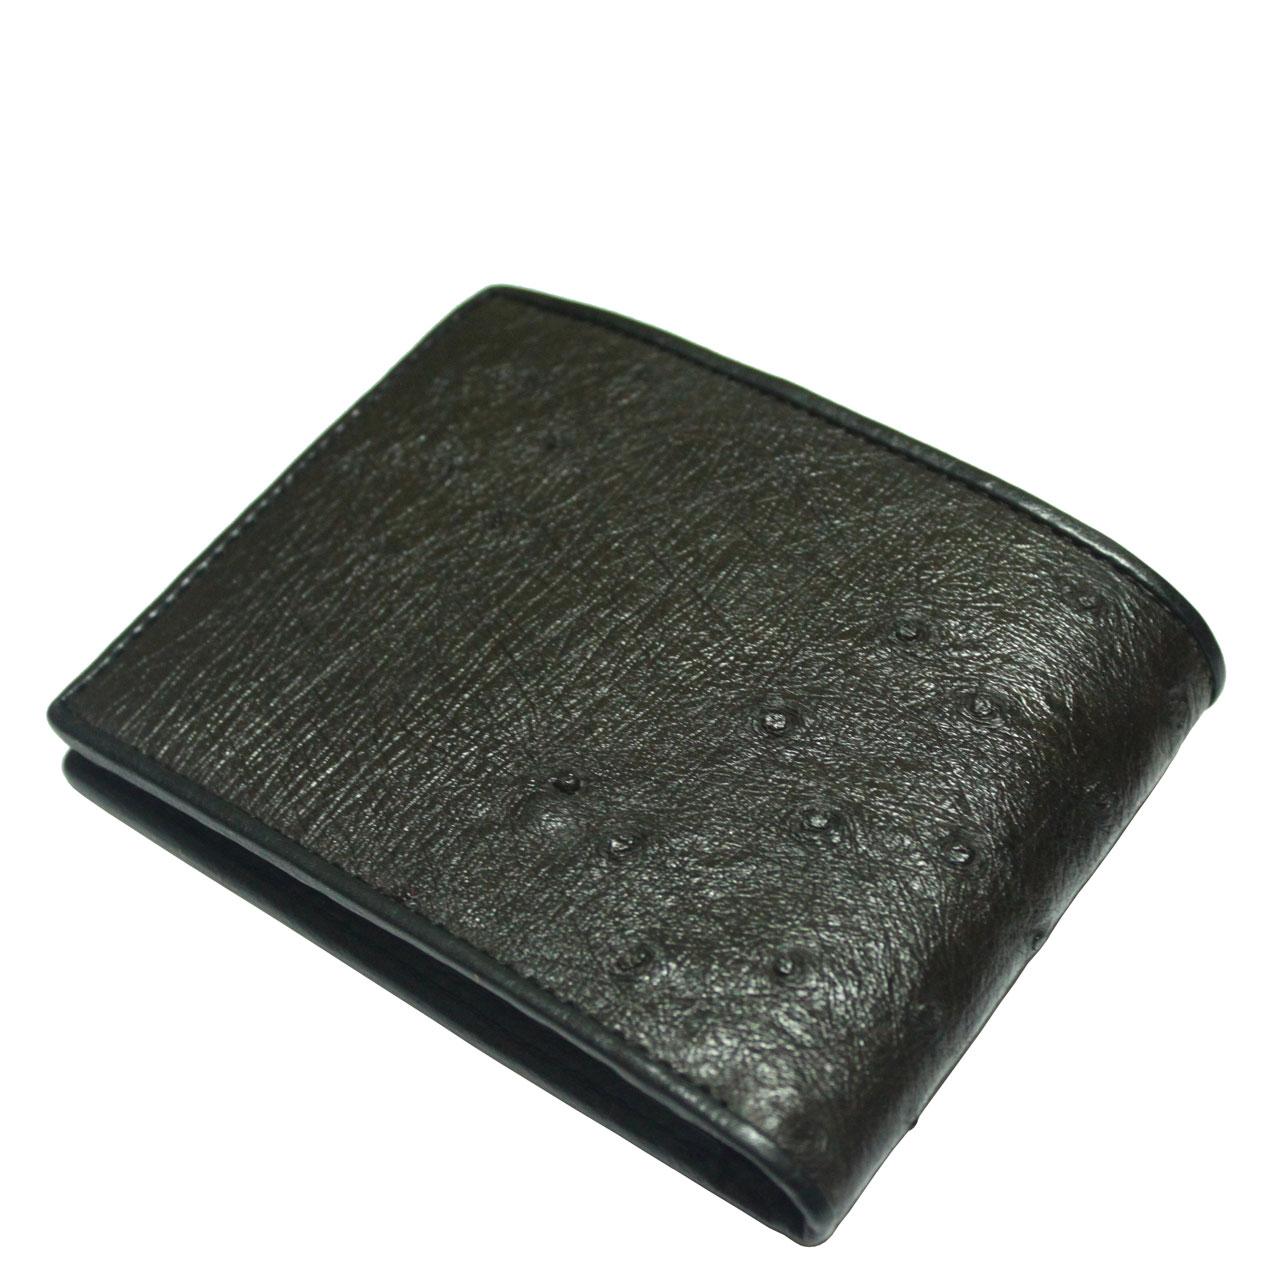 Ostrich Leather Wallet E403a